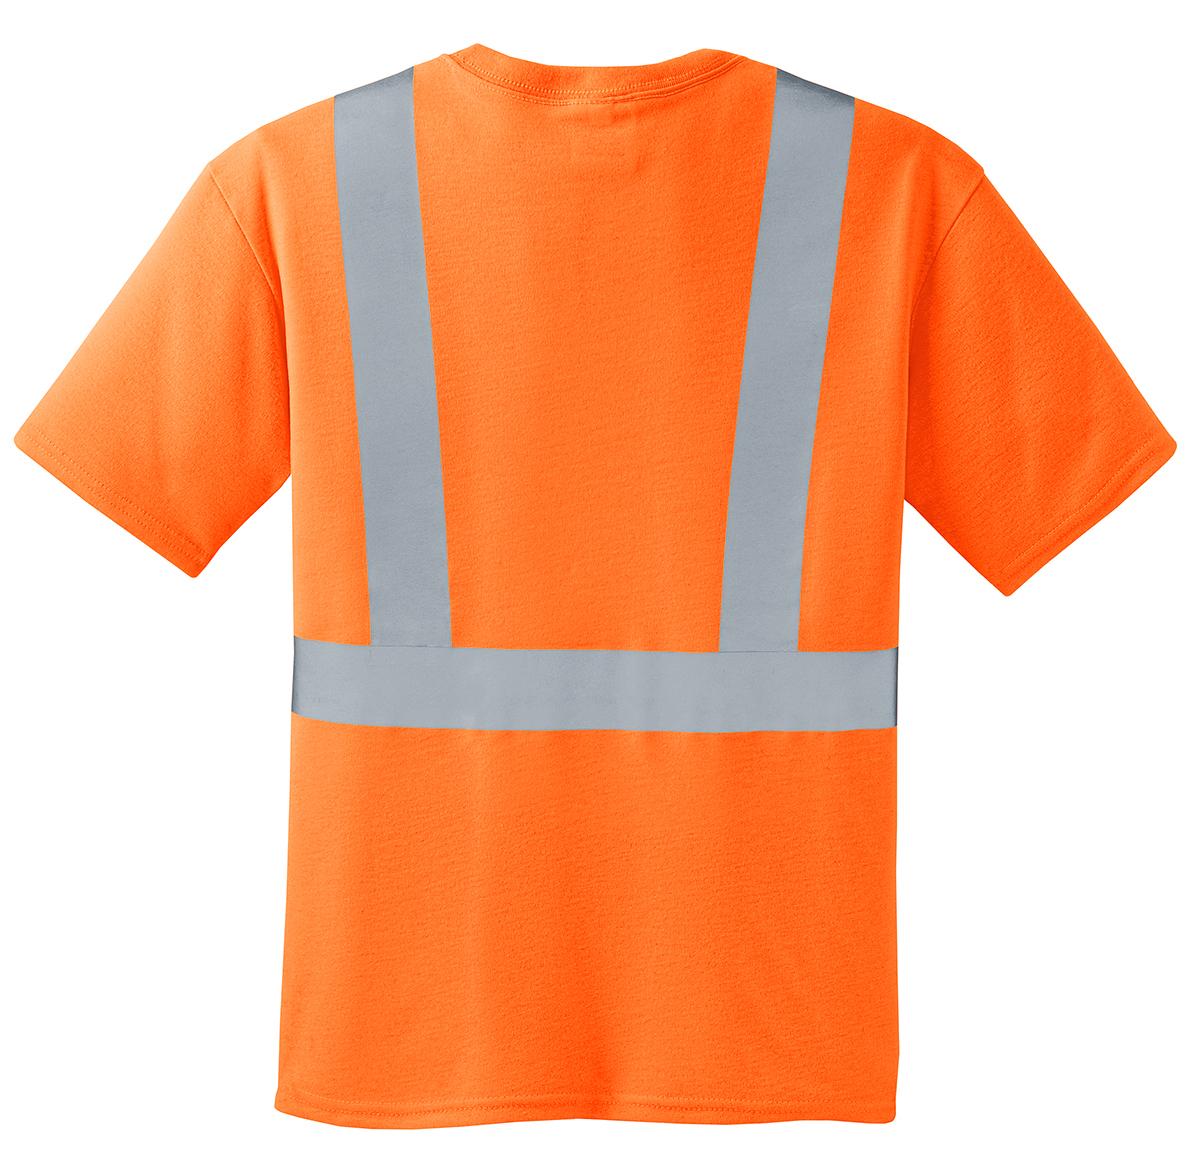 Cornerstone ansi 107 class 2 safety t shirt workwear for Safety logo t shirts